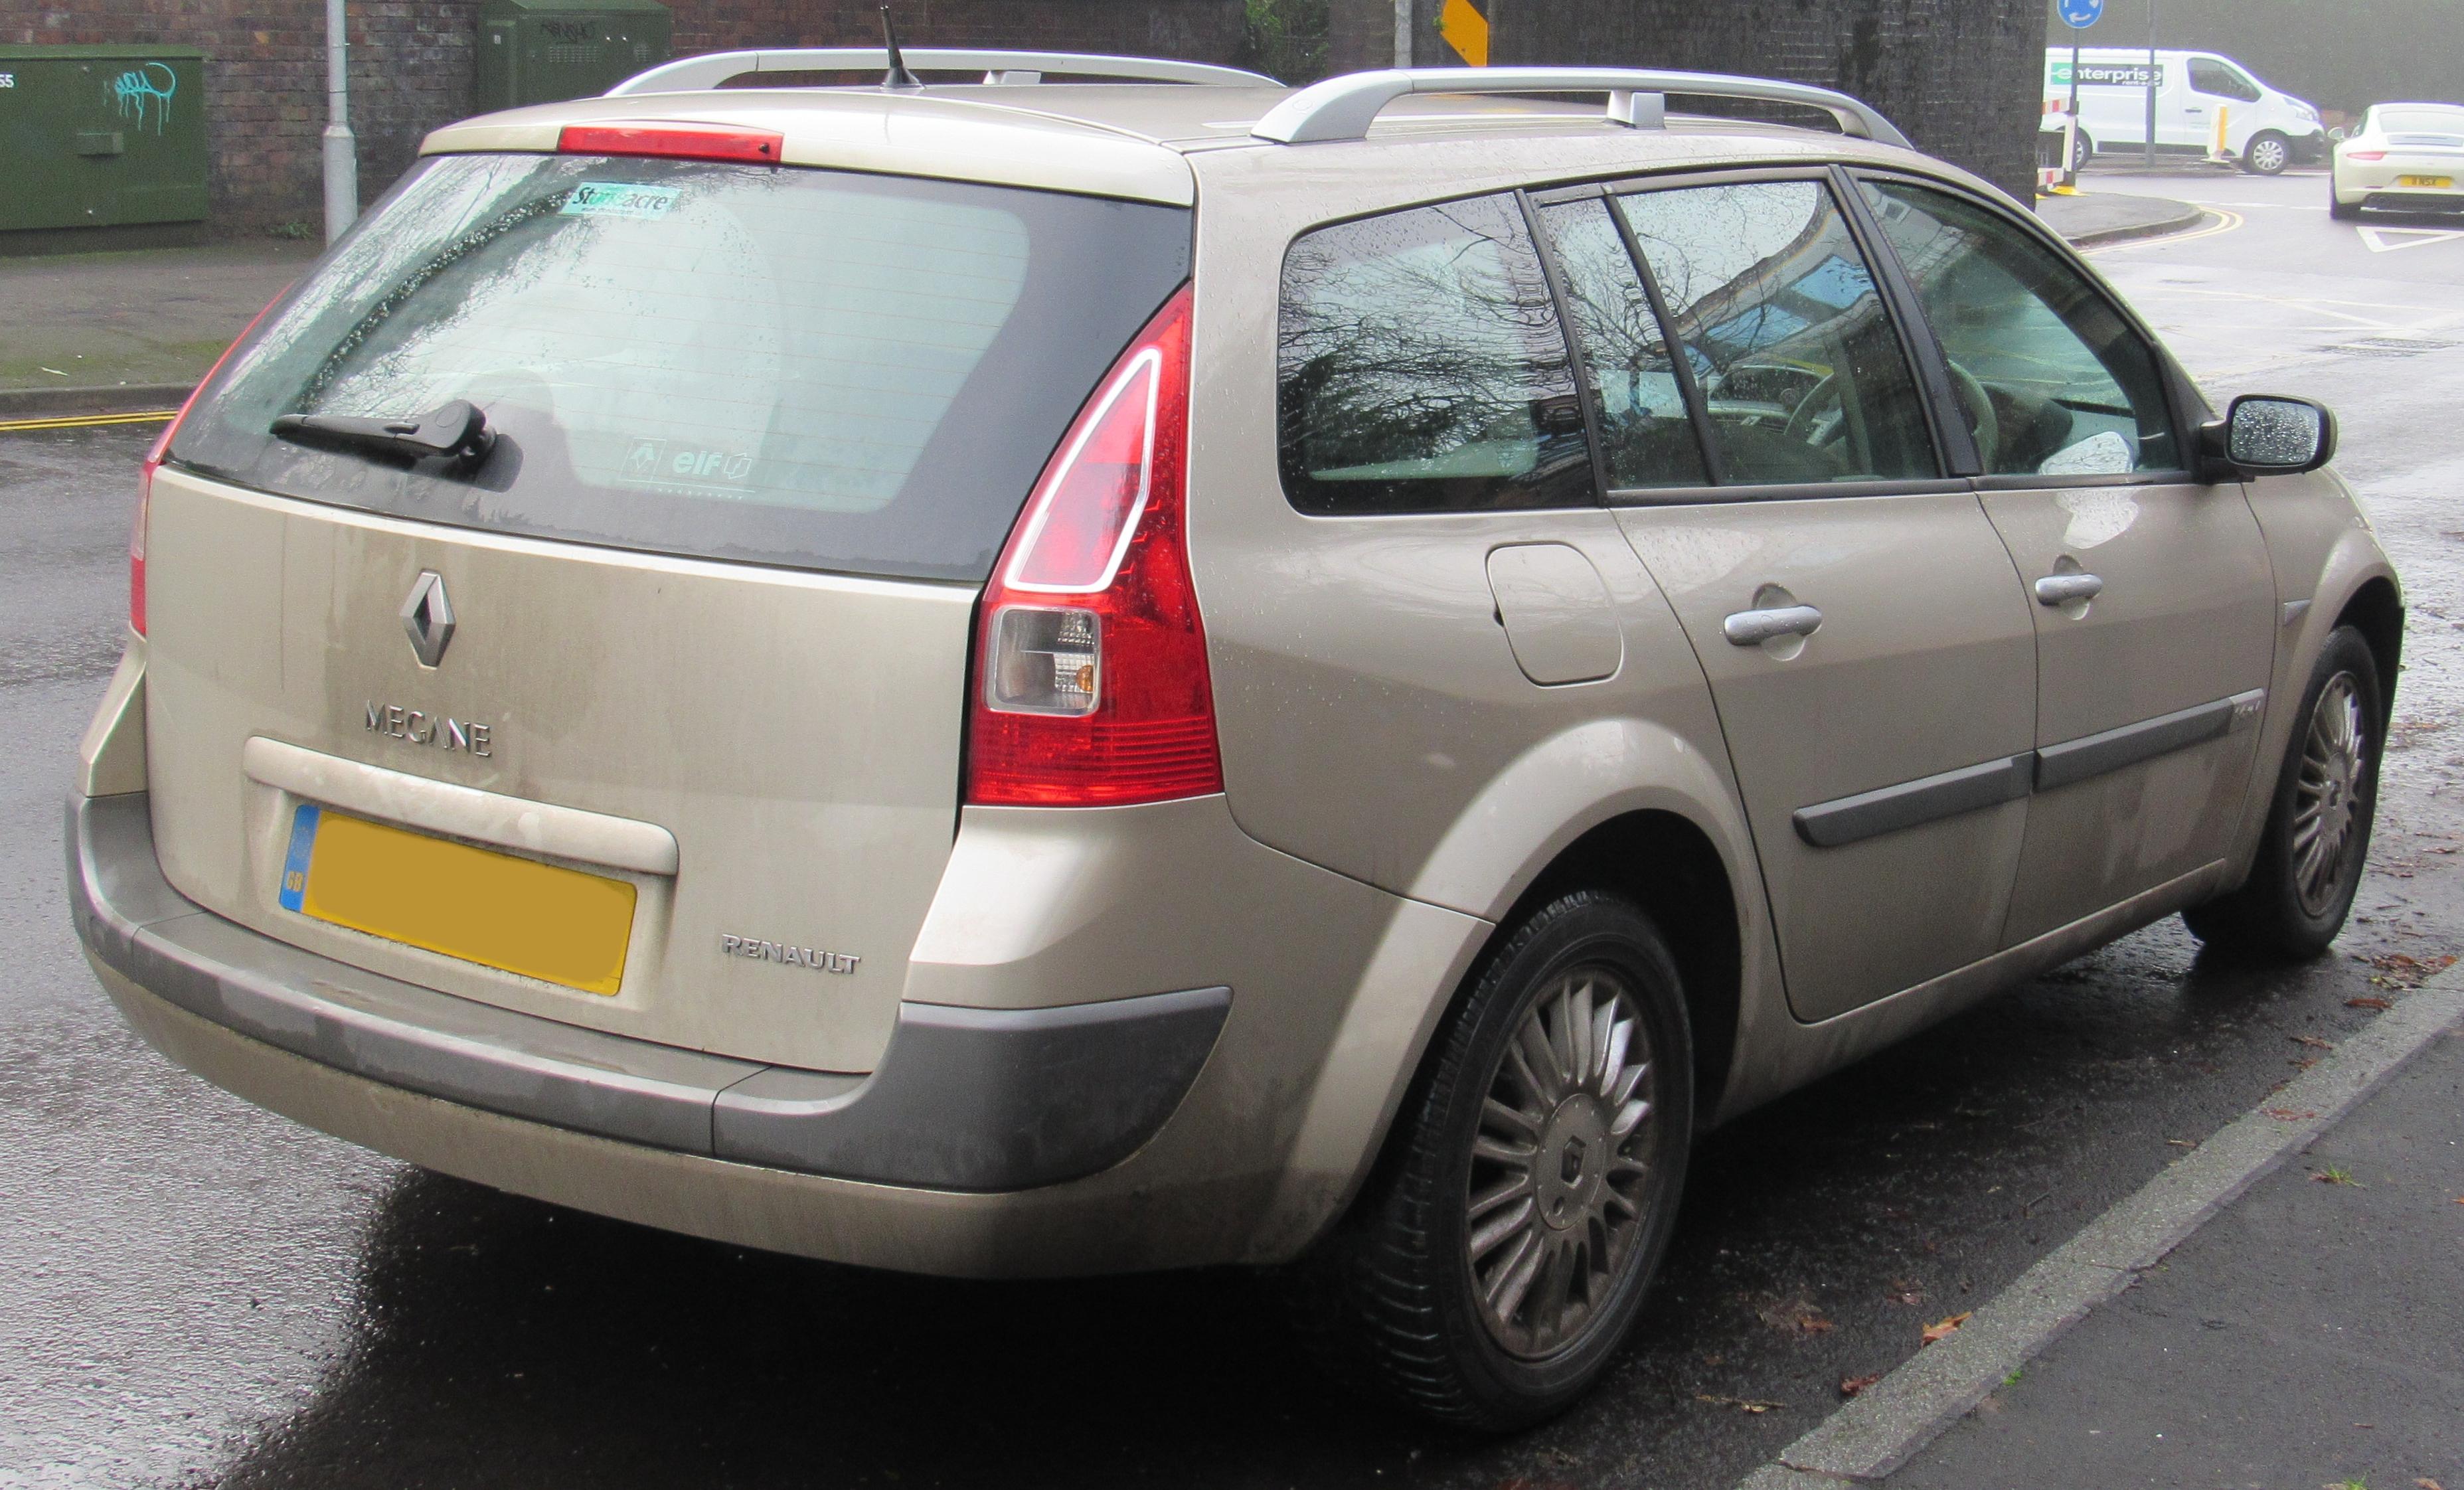 Masywnie File:2006 Renault Megane Privilege Estate Automatic facelift 1.6 ZF09